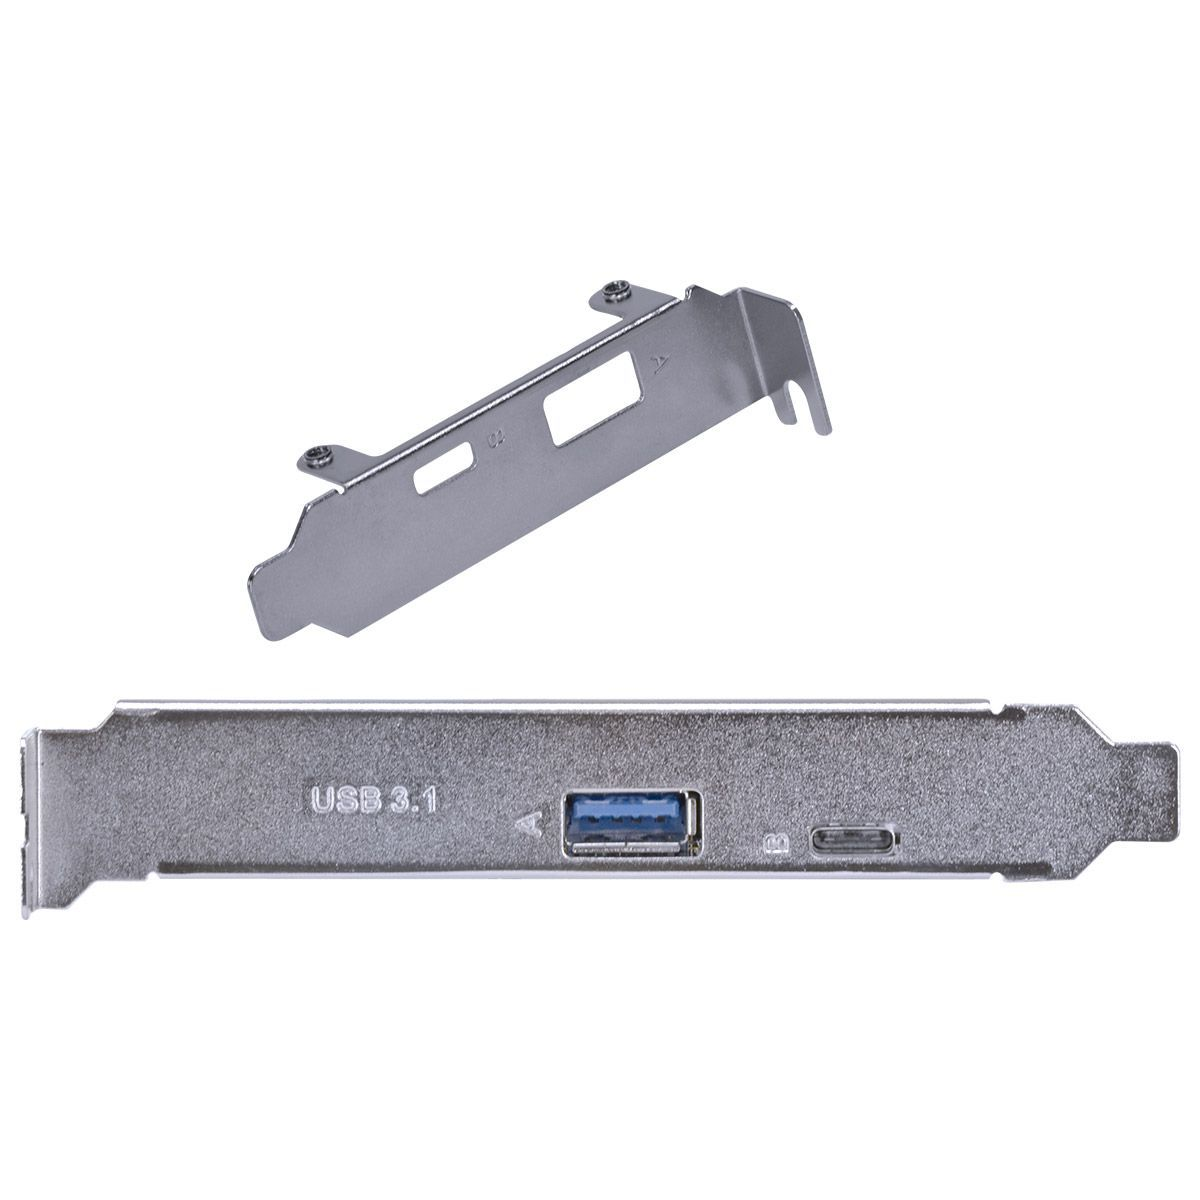 PLACA USB COM USB 3.0 + USB TIPO C 3.1 PCI EXPRESS PCI-E X4 COM LOW PROFILE - PU30C31-LP vinik